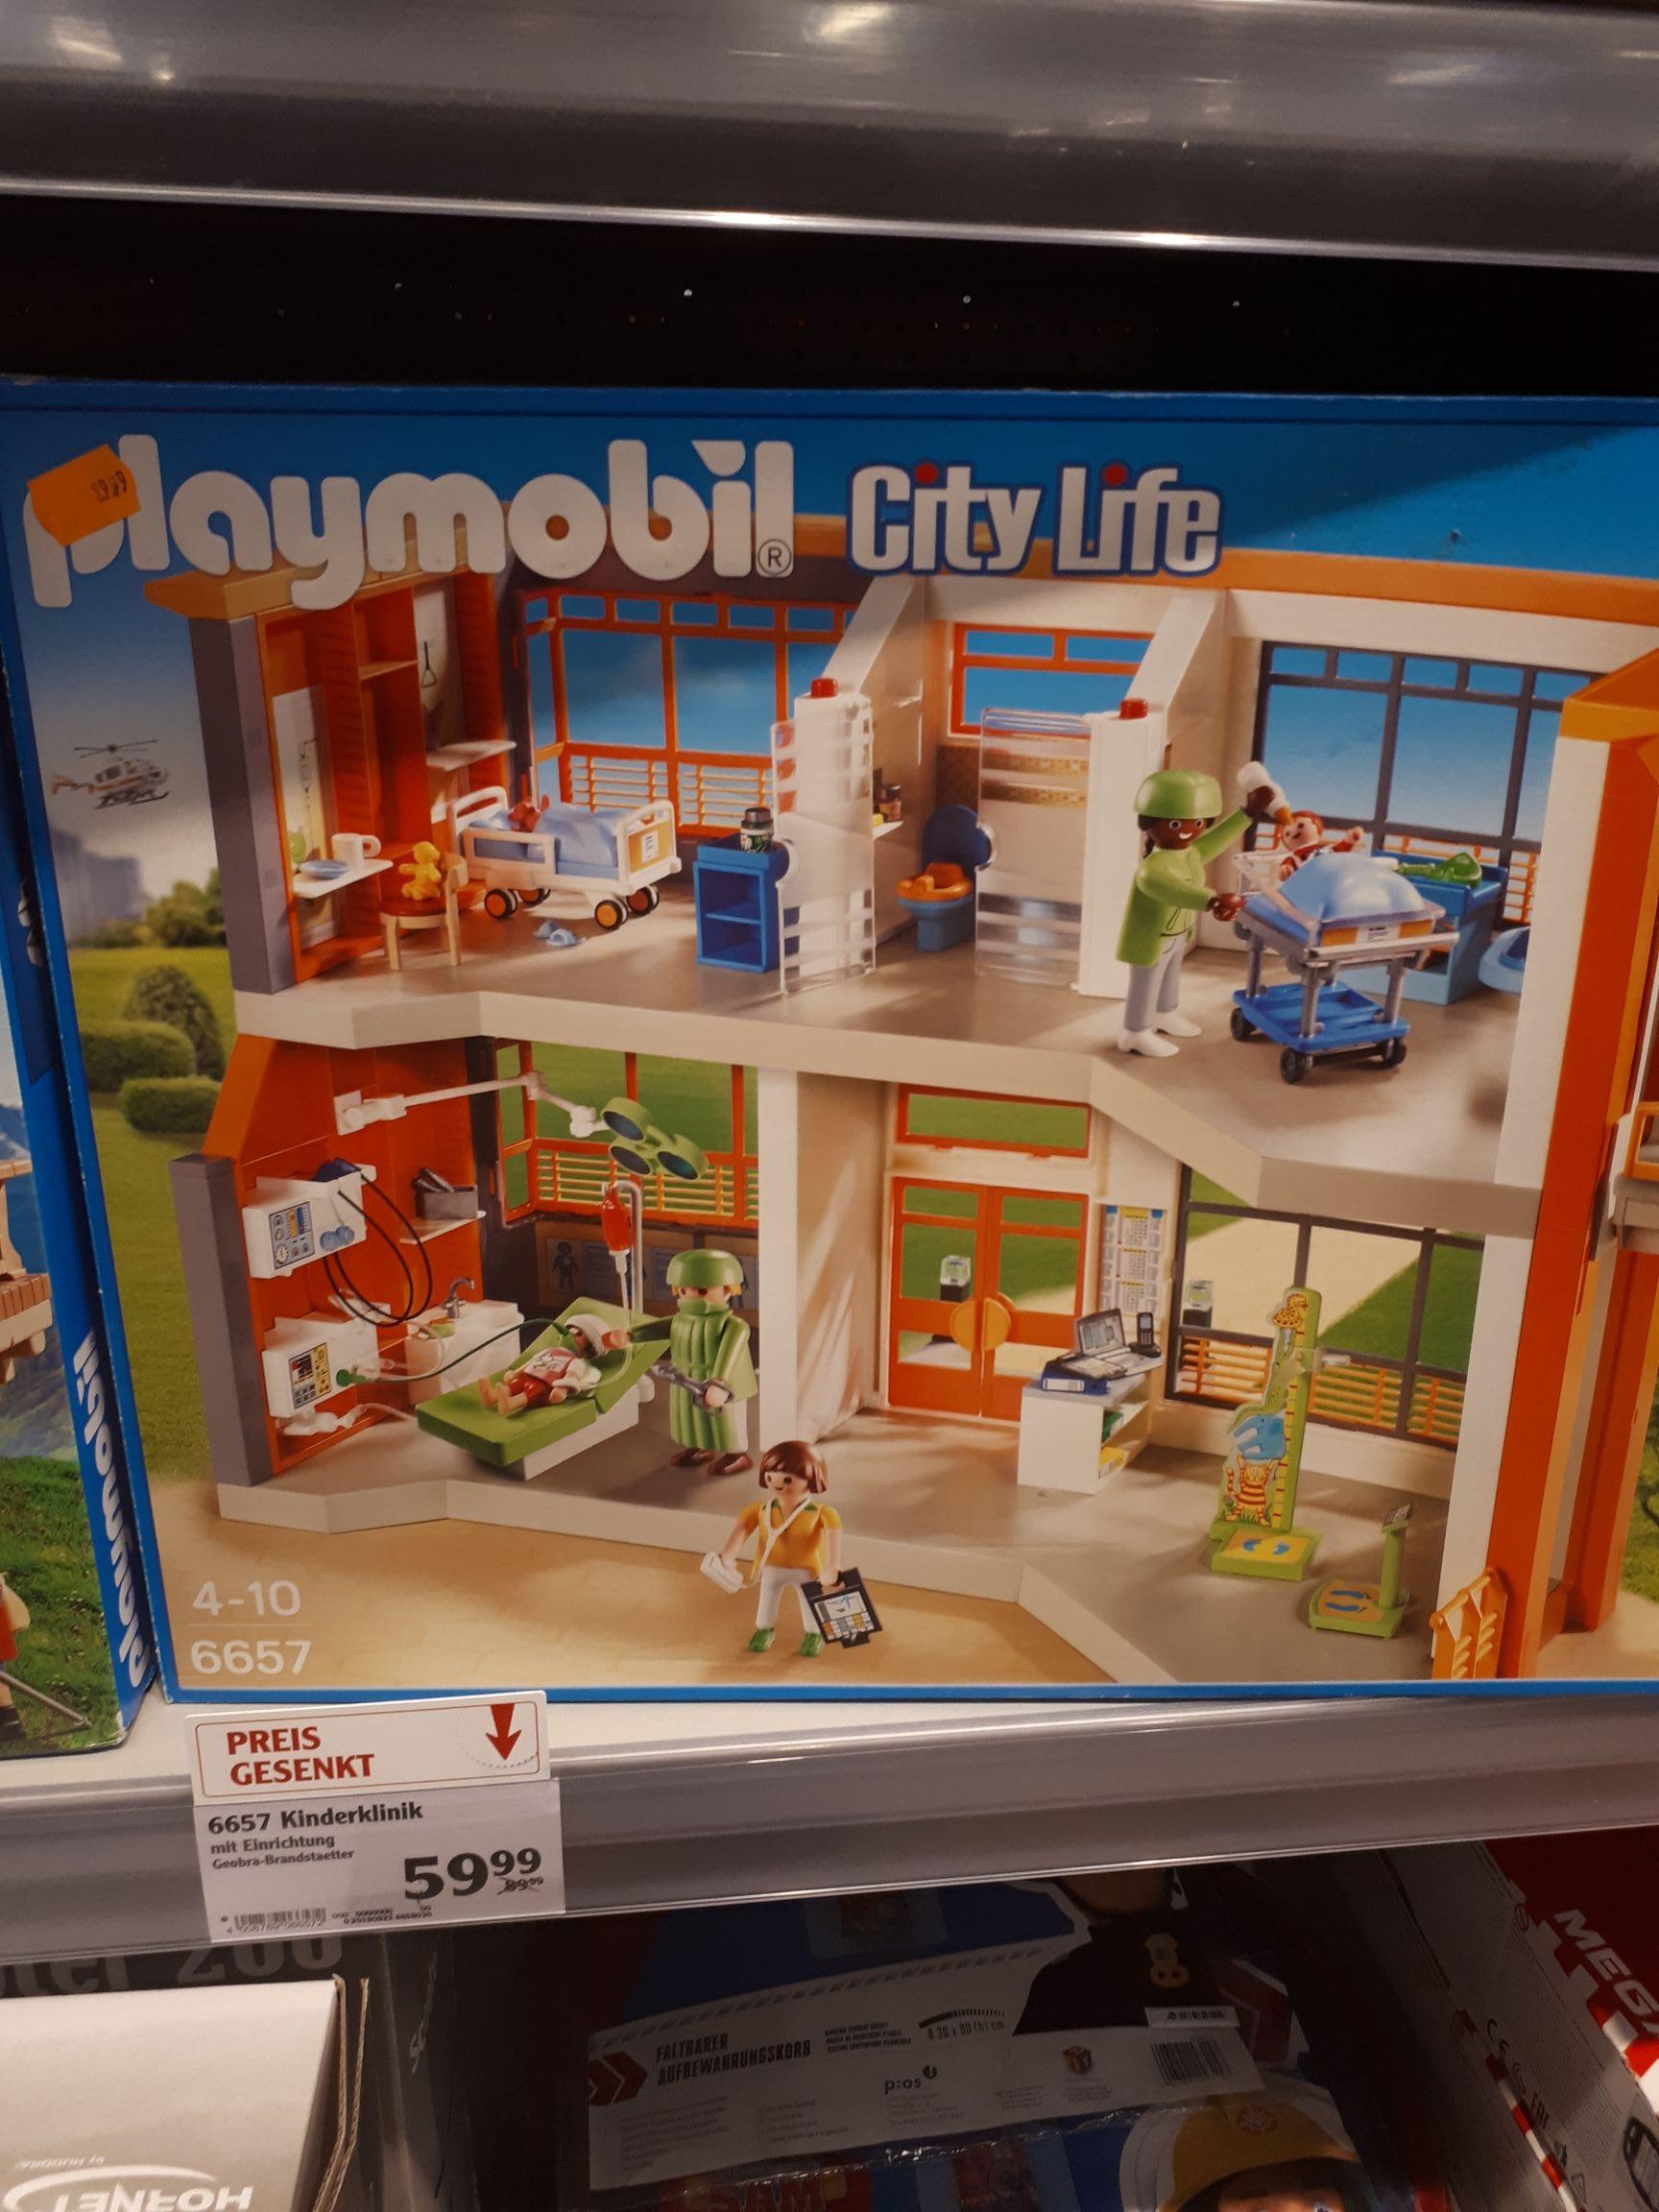 Playmobil Citylife - Kinderklinik mit Einrichtung (6657)**Lokal**